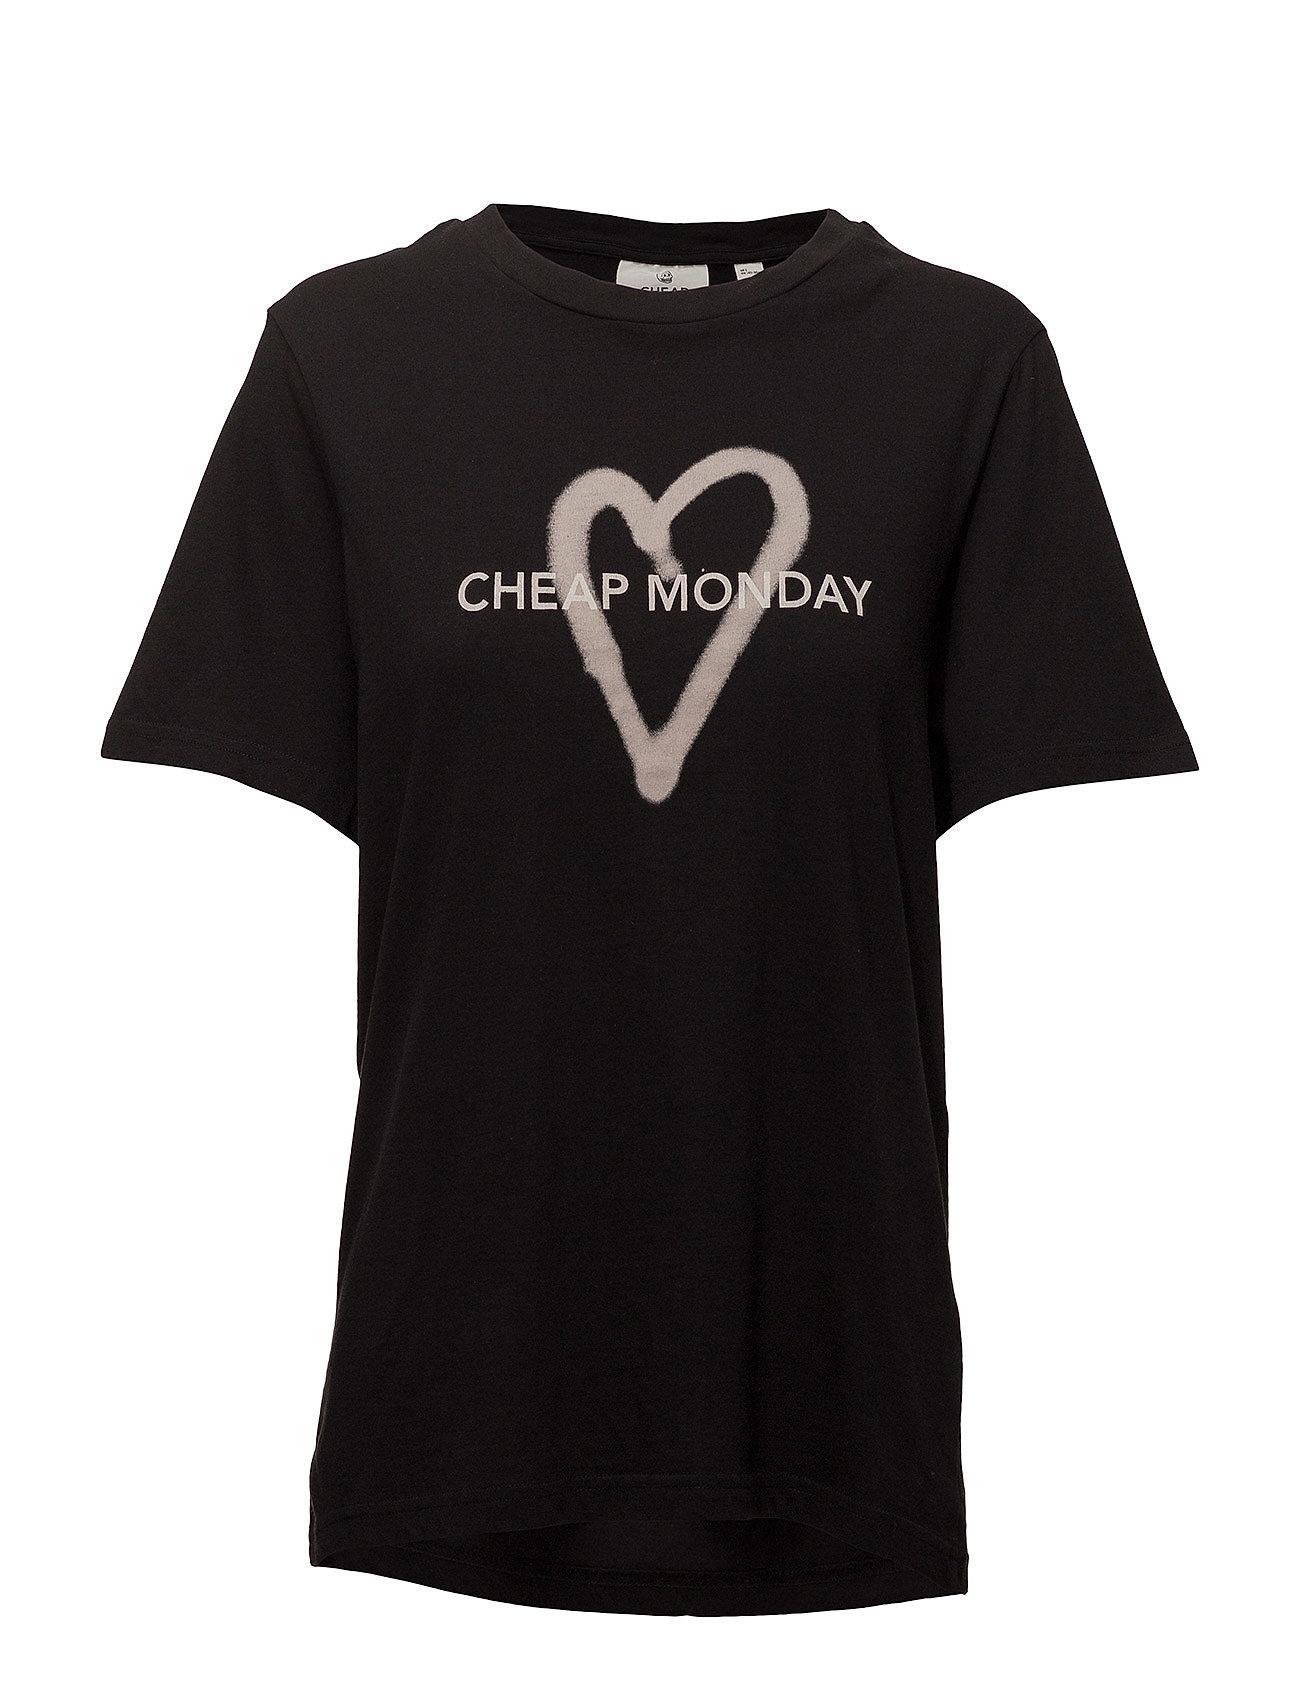 Cheap Monday Breeze tee Love logo